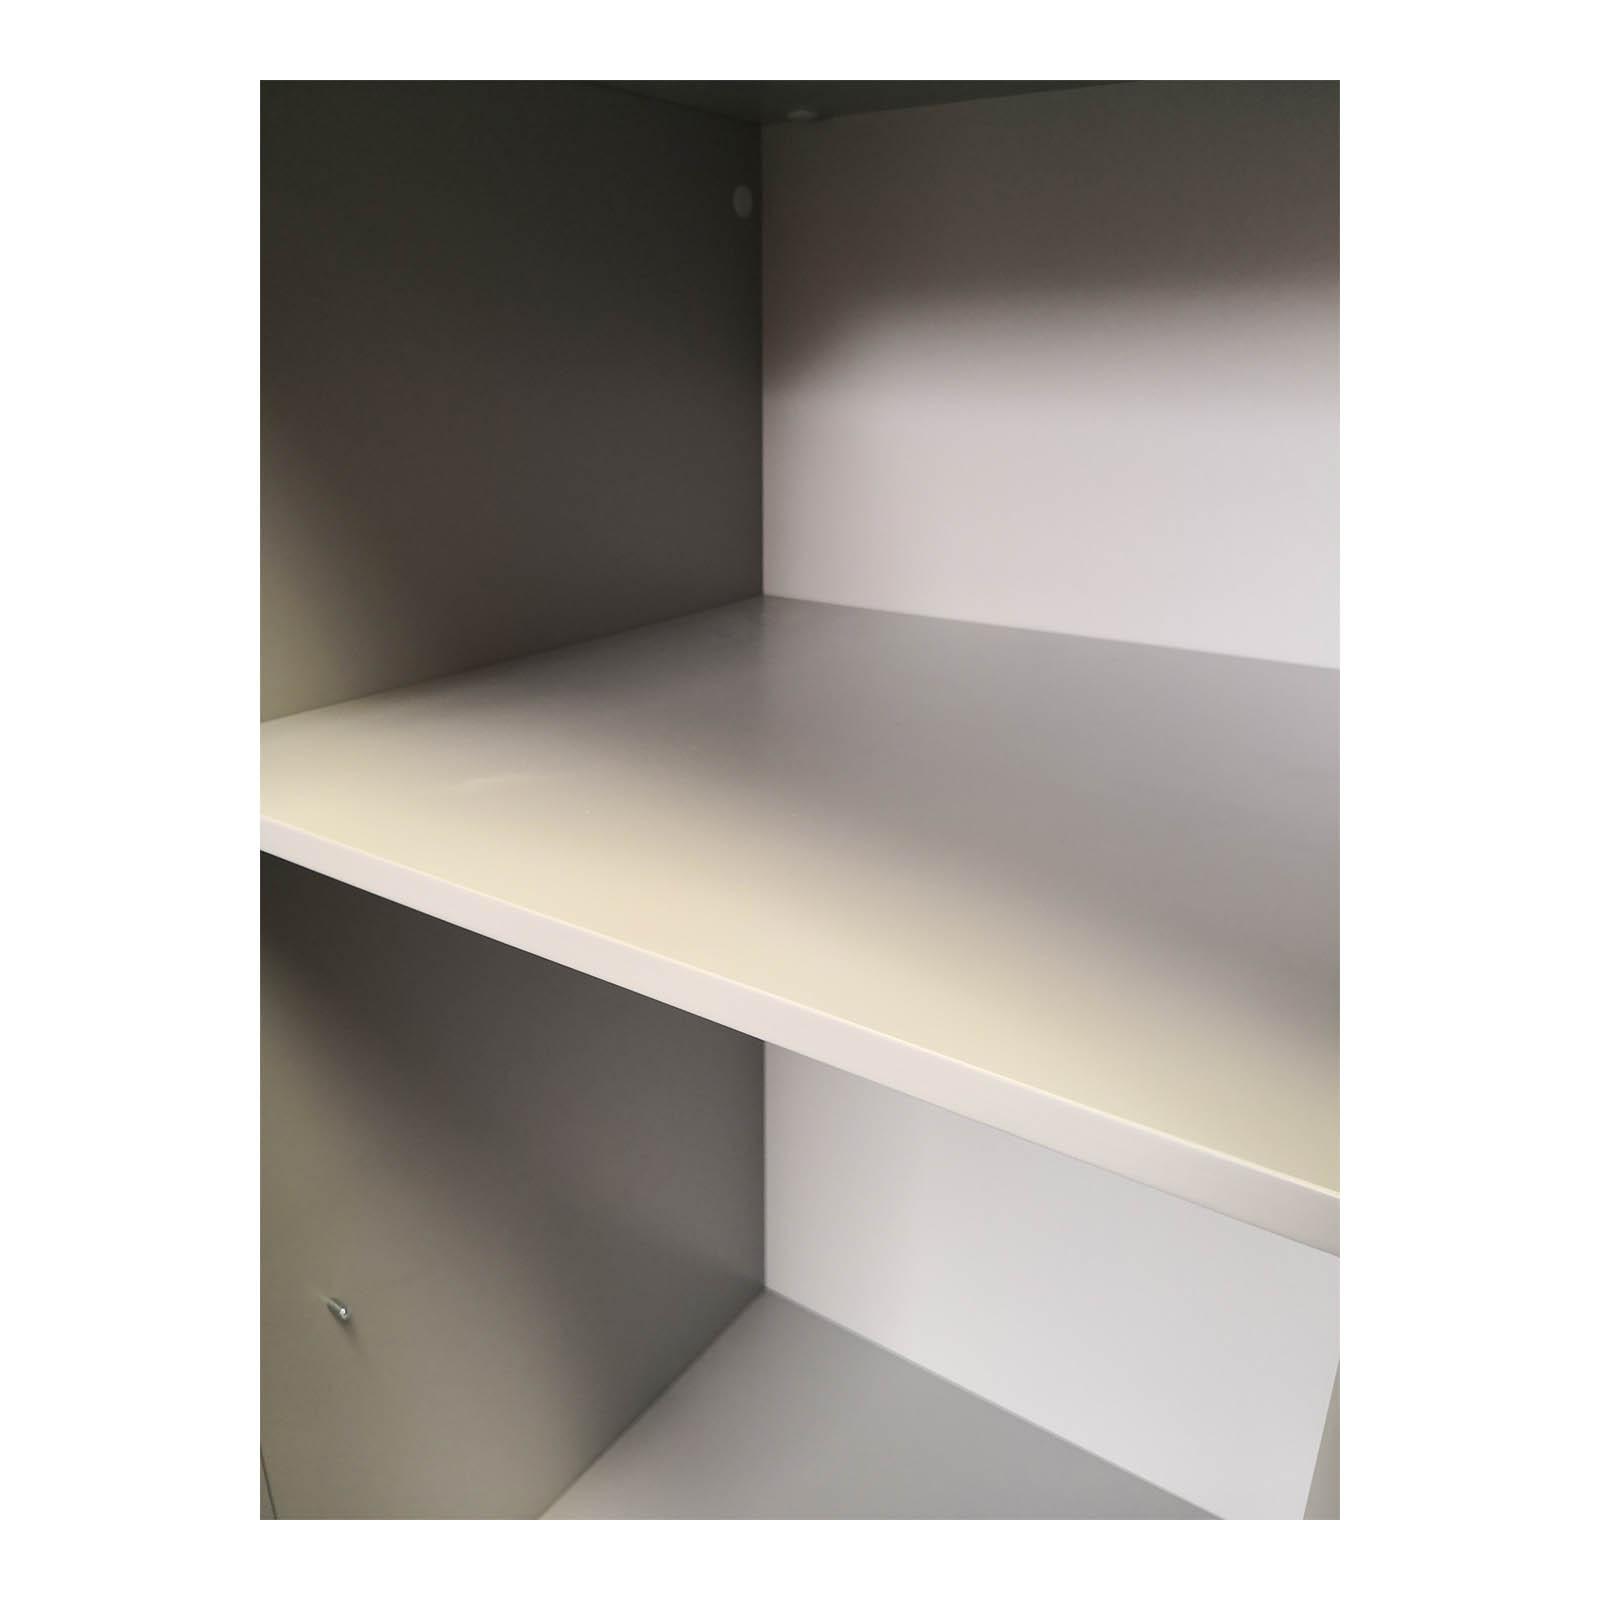 Two Design Lovers teal storage cabinet inside